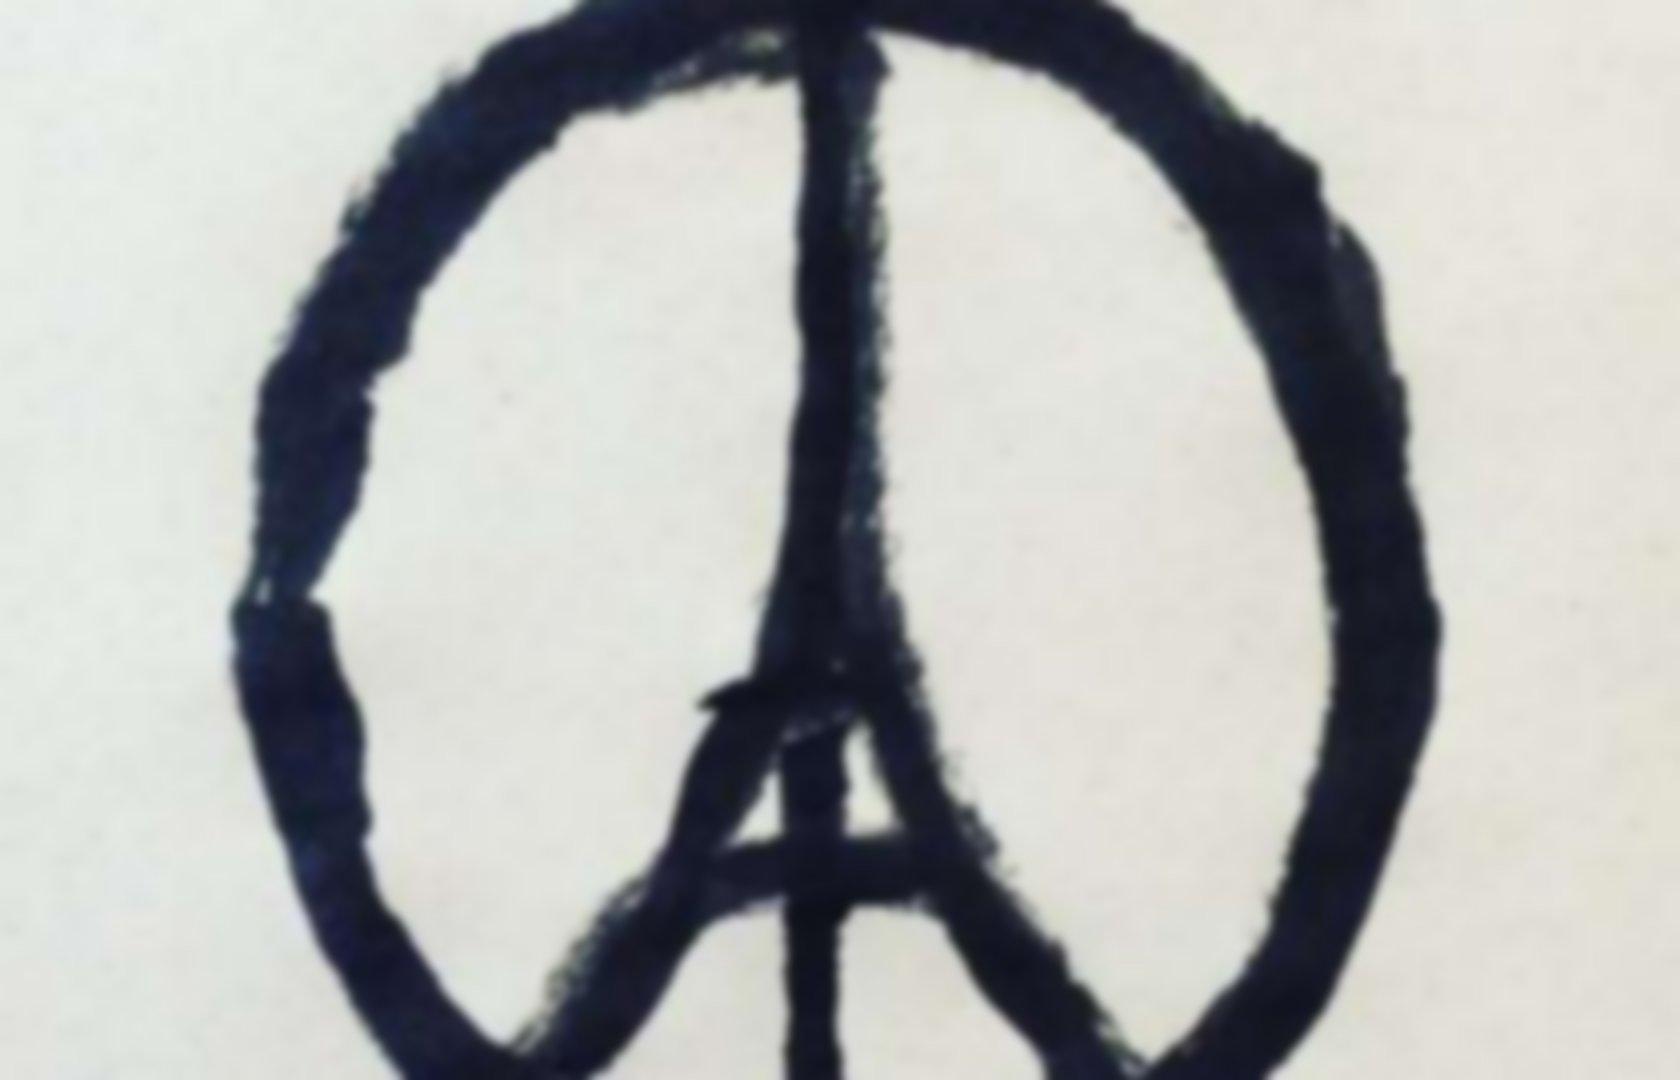 Paris attacks symbolism pearltrees biocorpaavc Choice Image